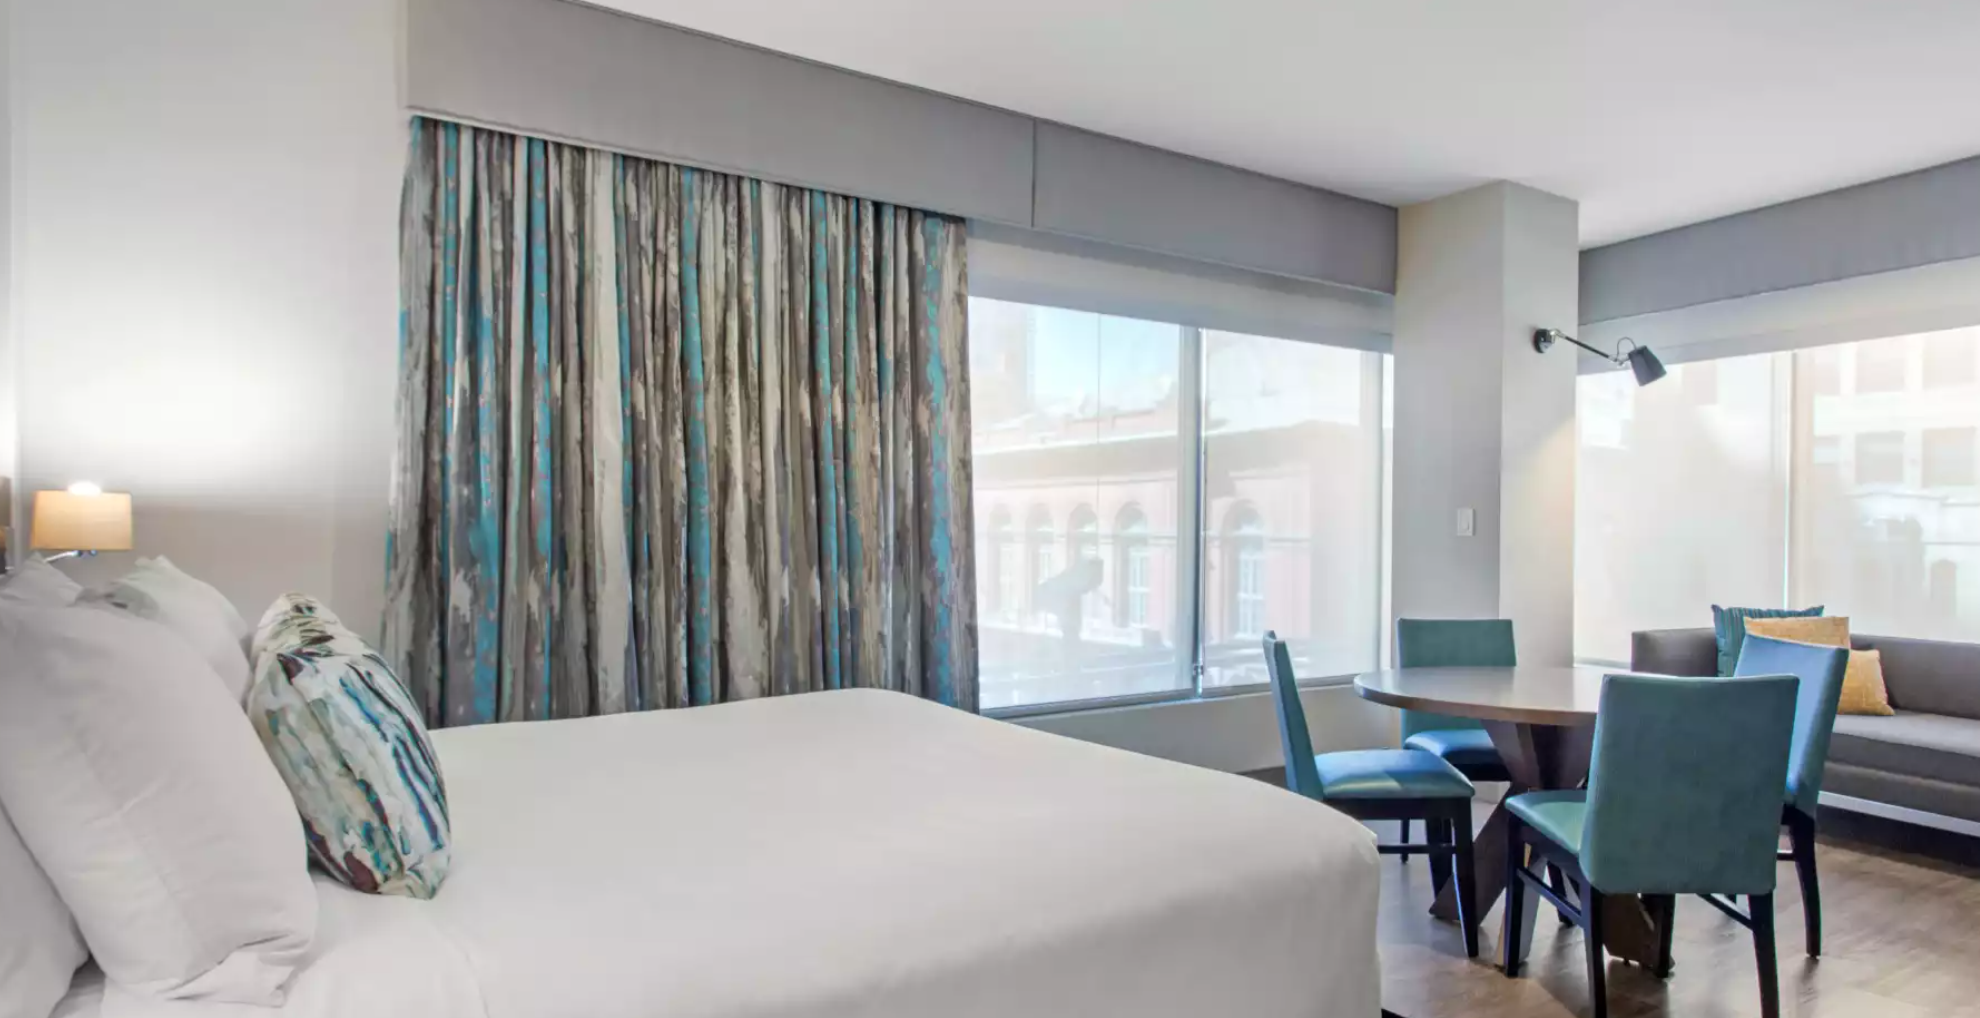 https://www.hotelsbyday.com/_data/default-hotel_image/3/18191/screenshot-2020-06-11-at-3-58-08-pm.png